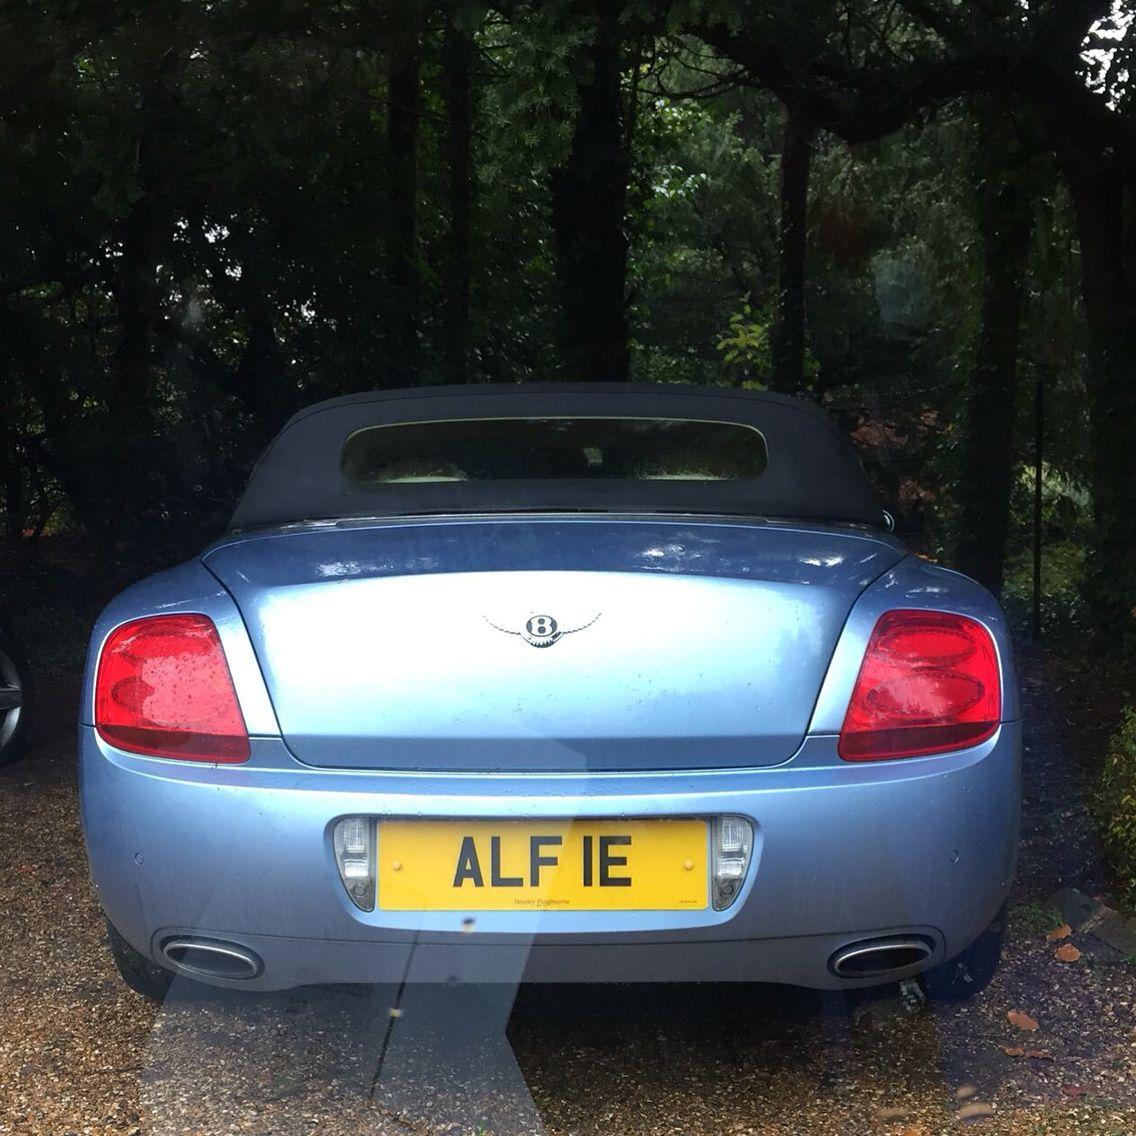 "2002 Mercedes Benz Clk Gtr Super Sport Gallery: Fantastic ""ALFIE"" Number Plate Spotted On A Bentley"